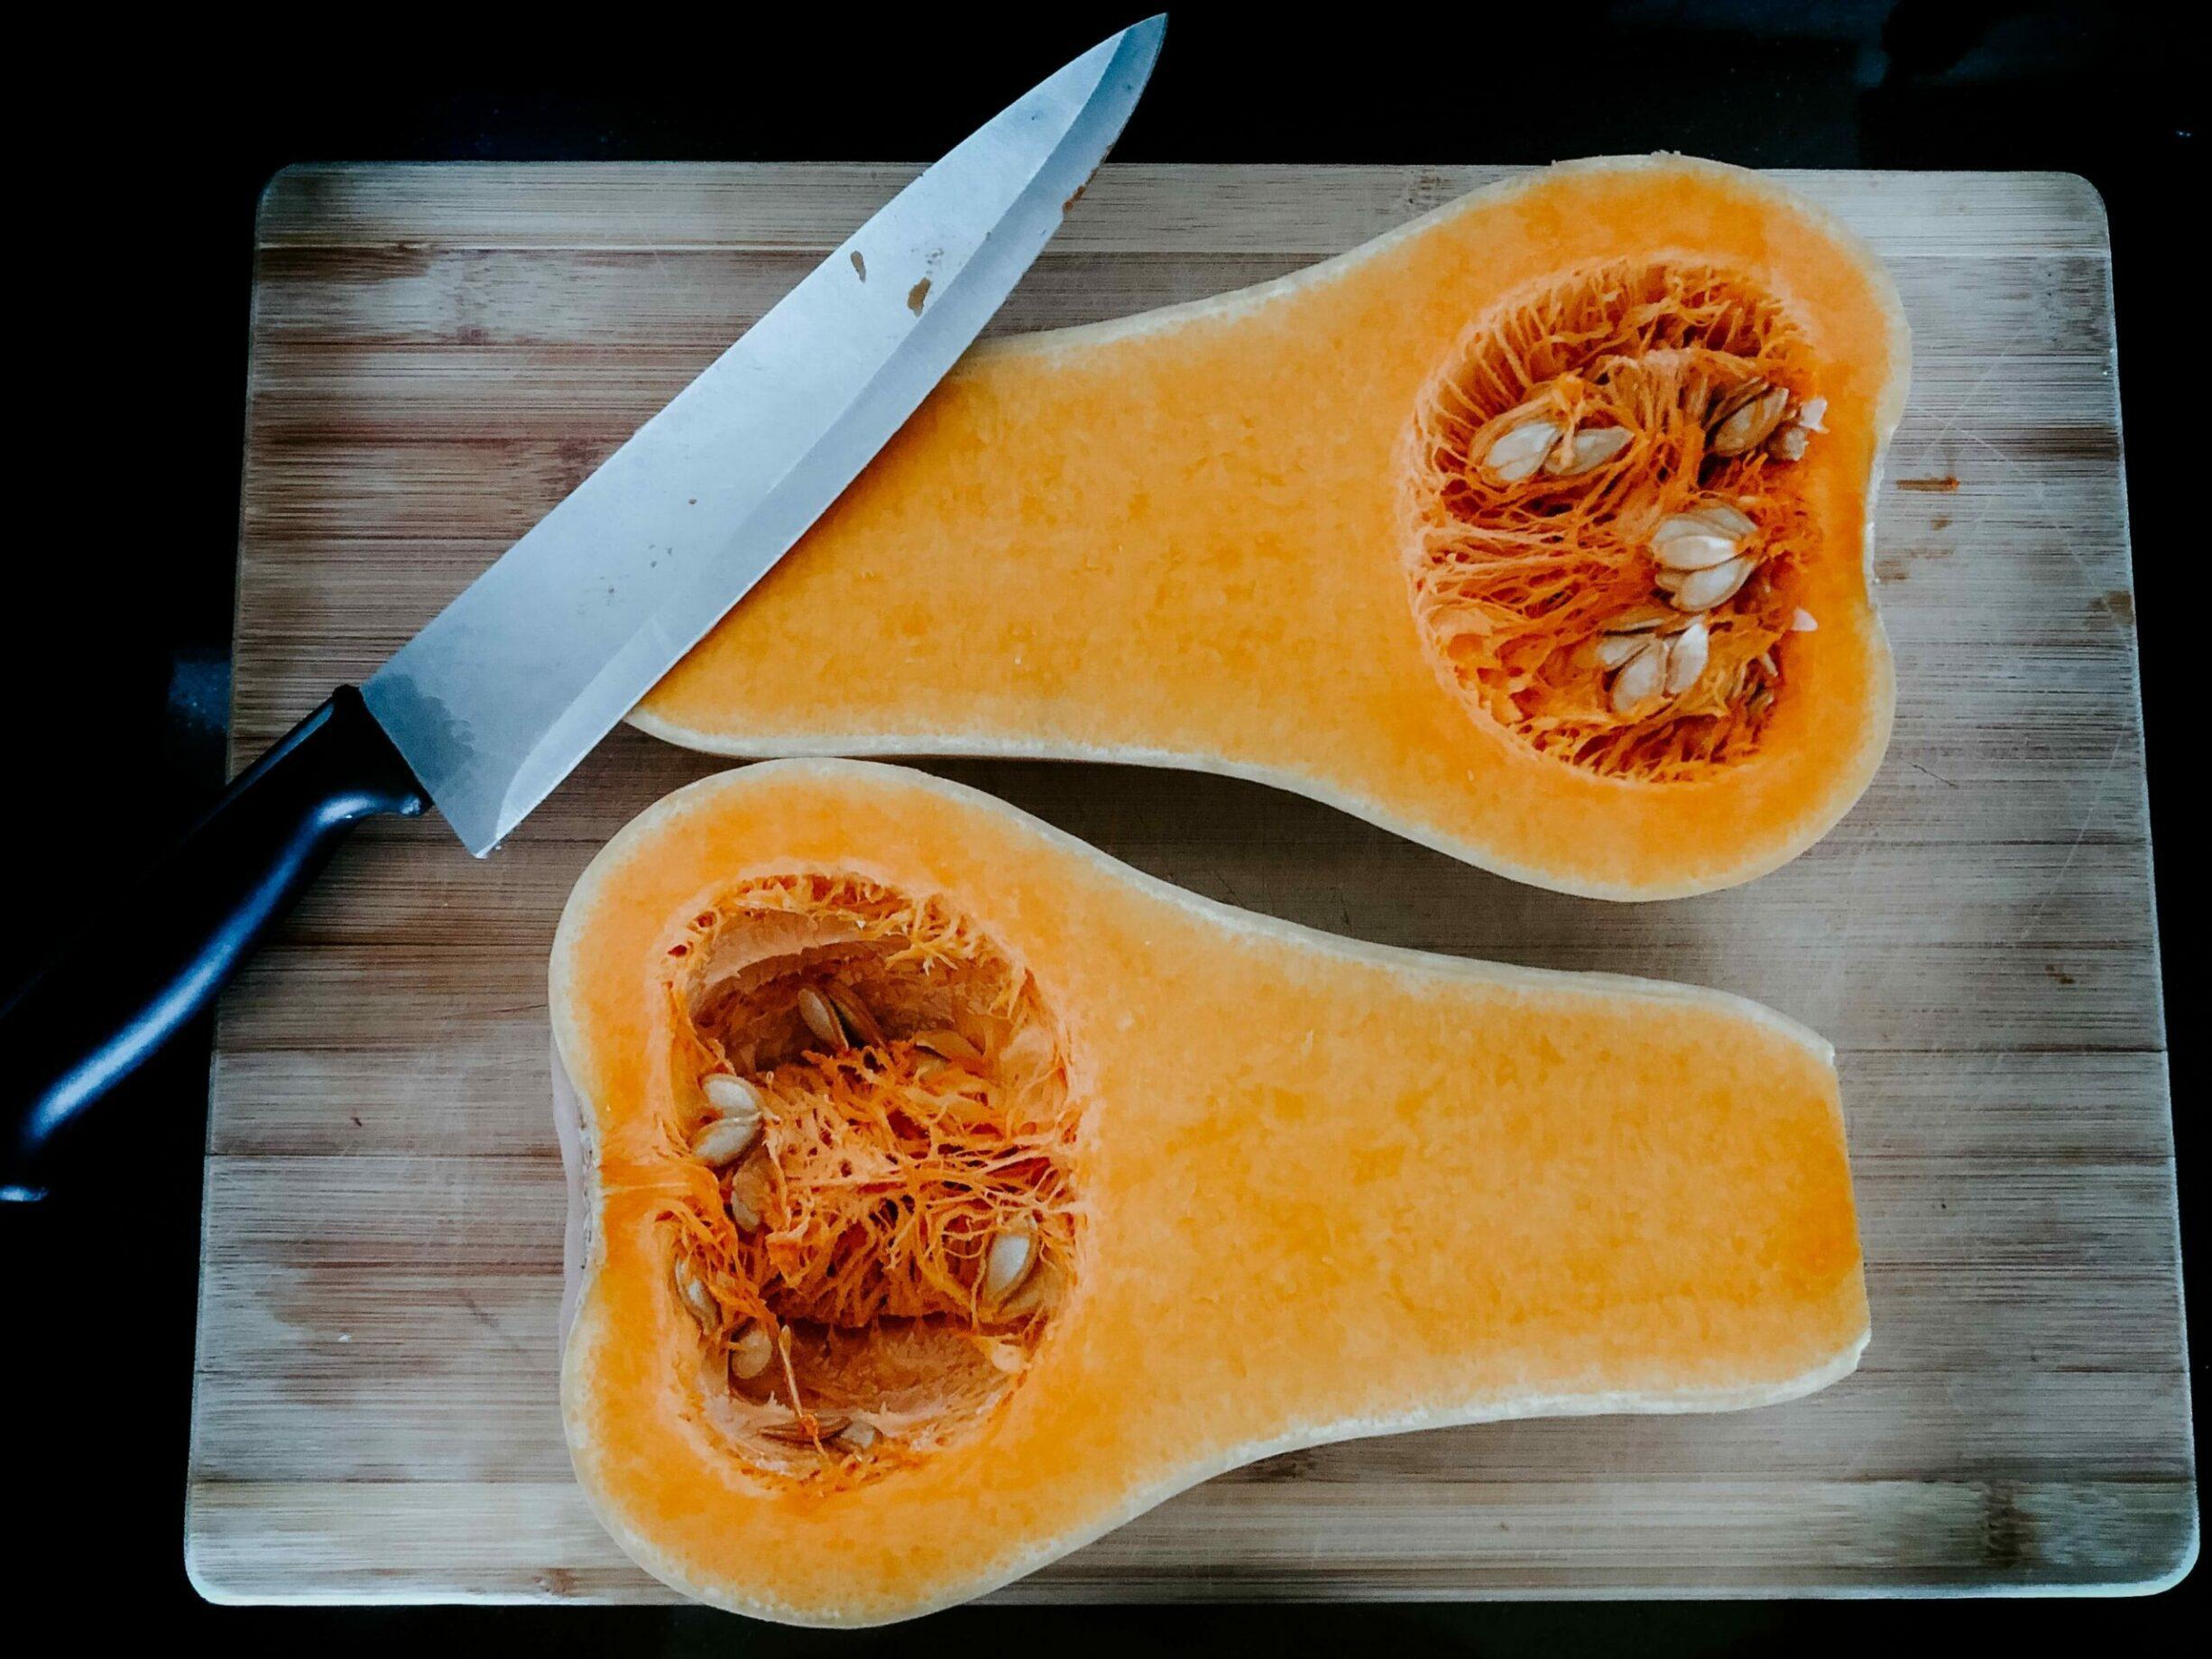 butternut squash cut in half on a wooden cutting board, sharp knife